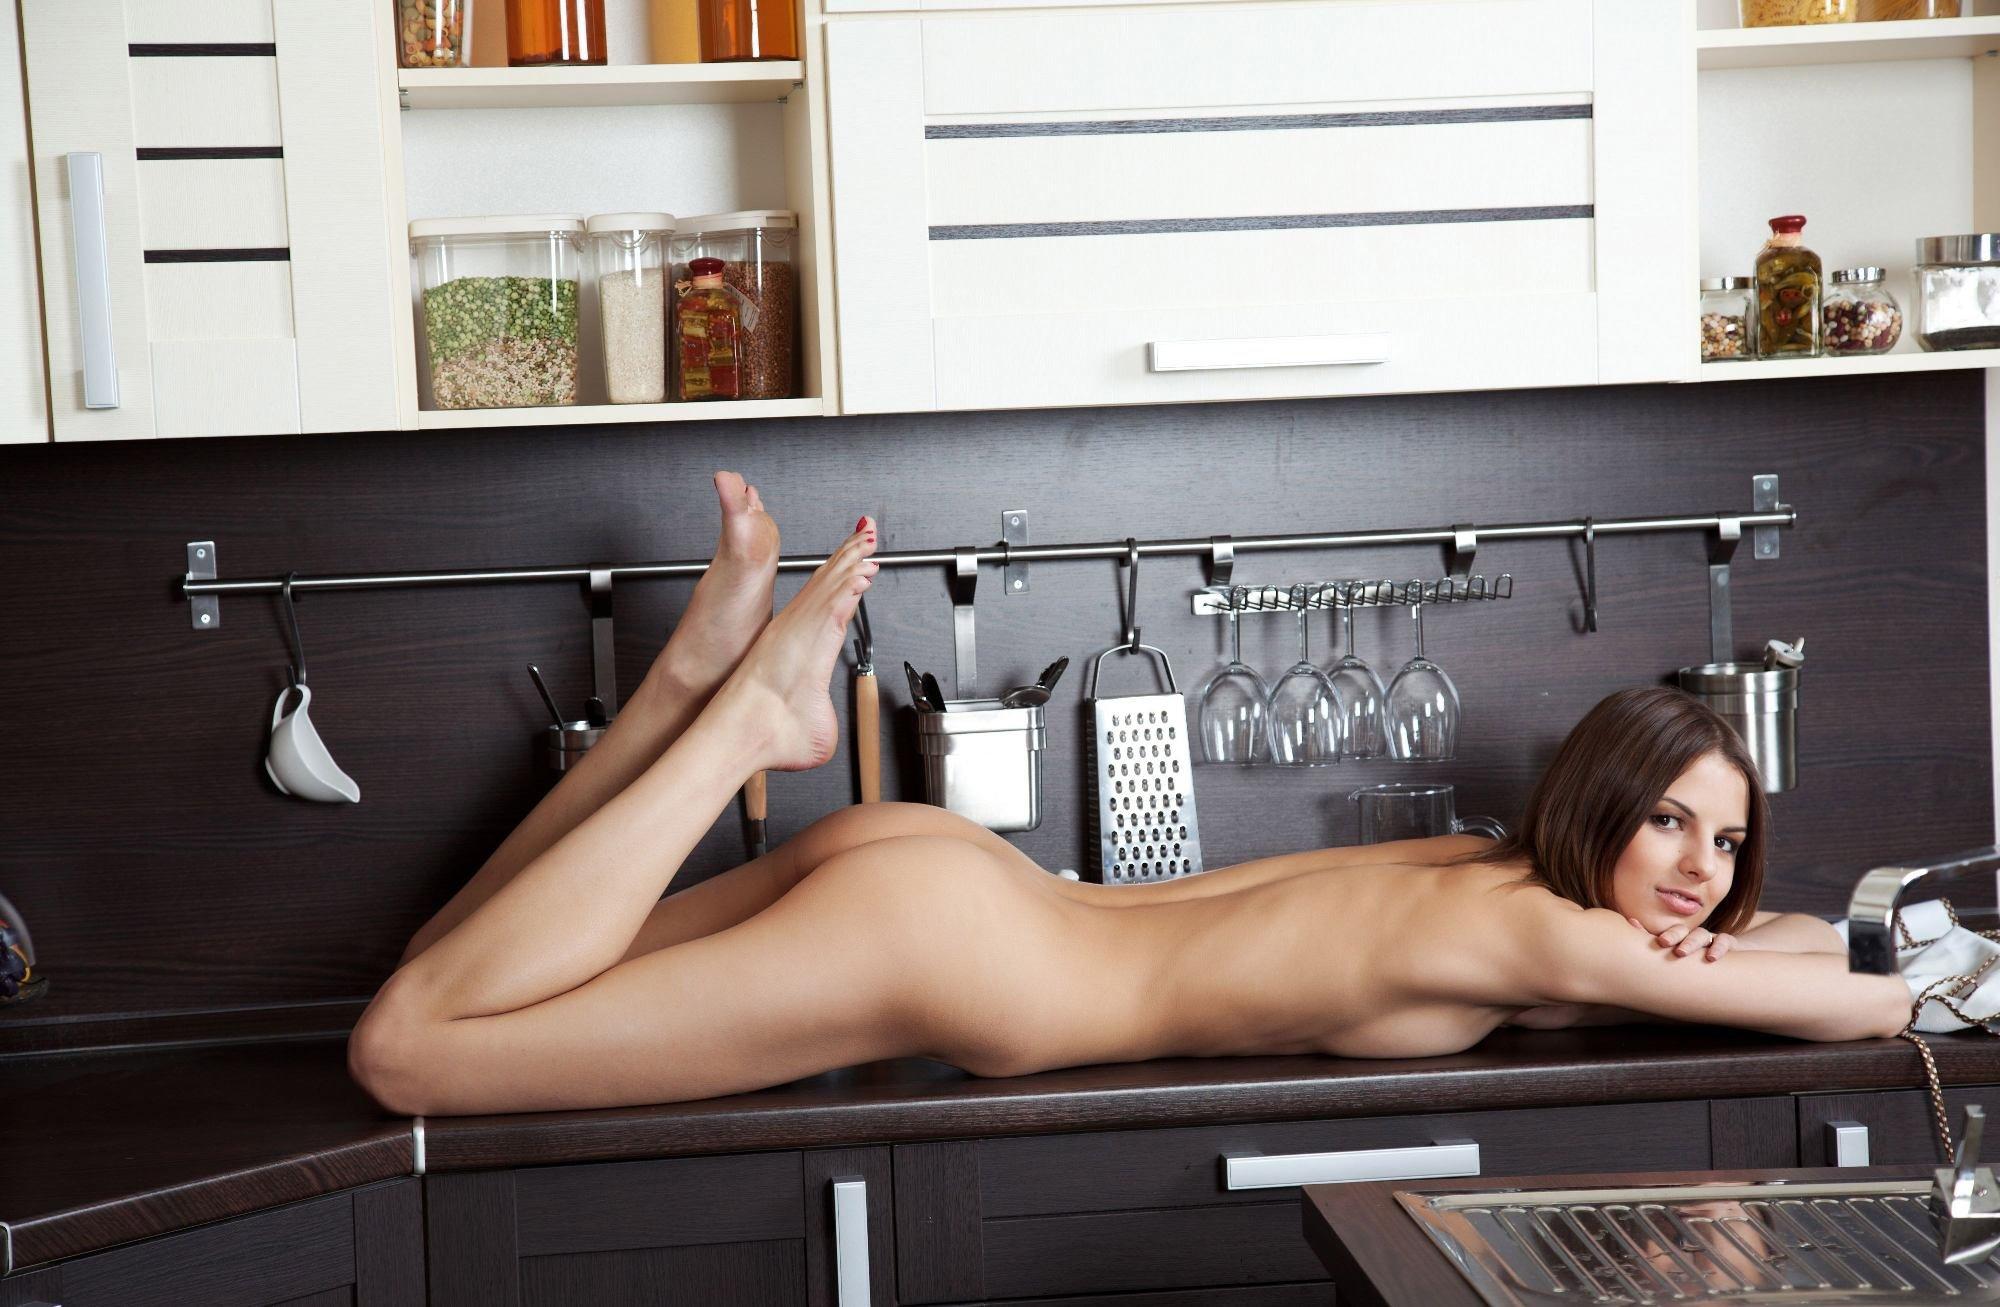 Mature woman kitchen sex